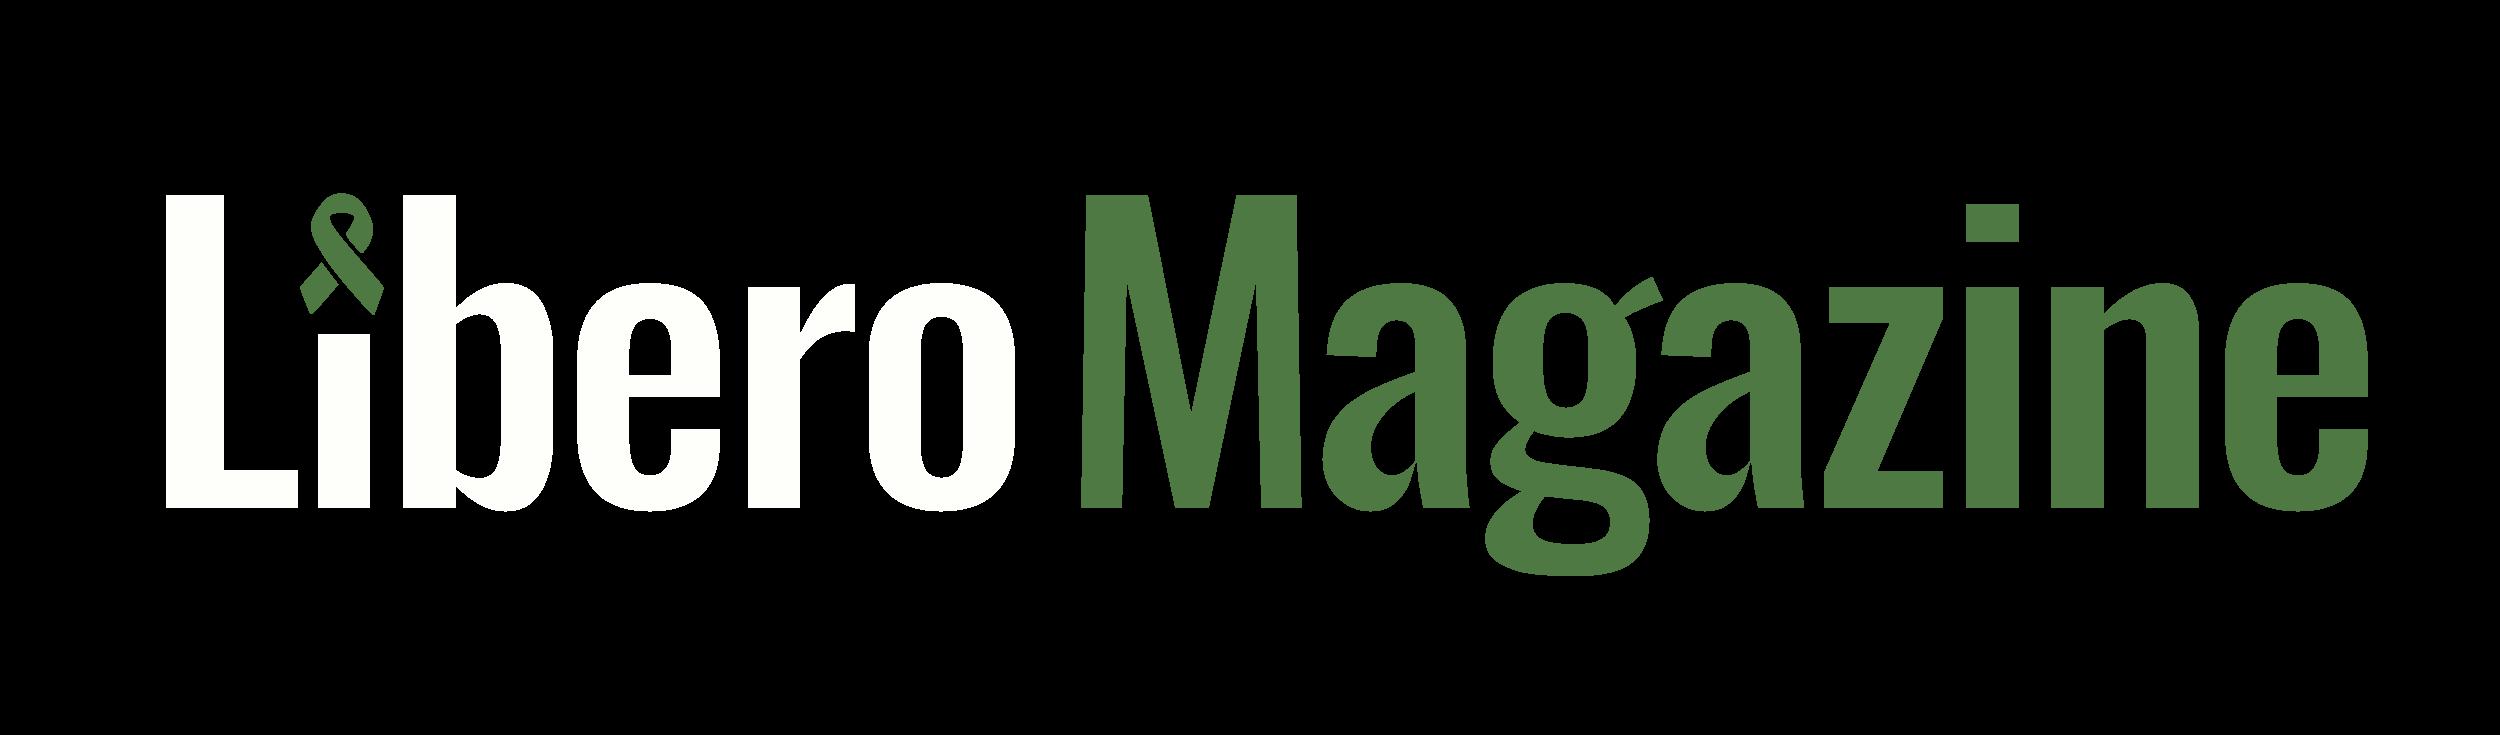 Libero Magazine